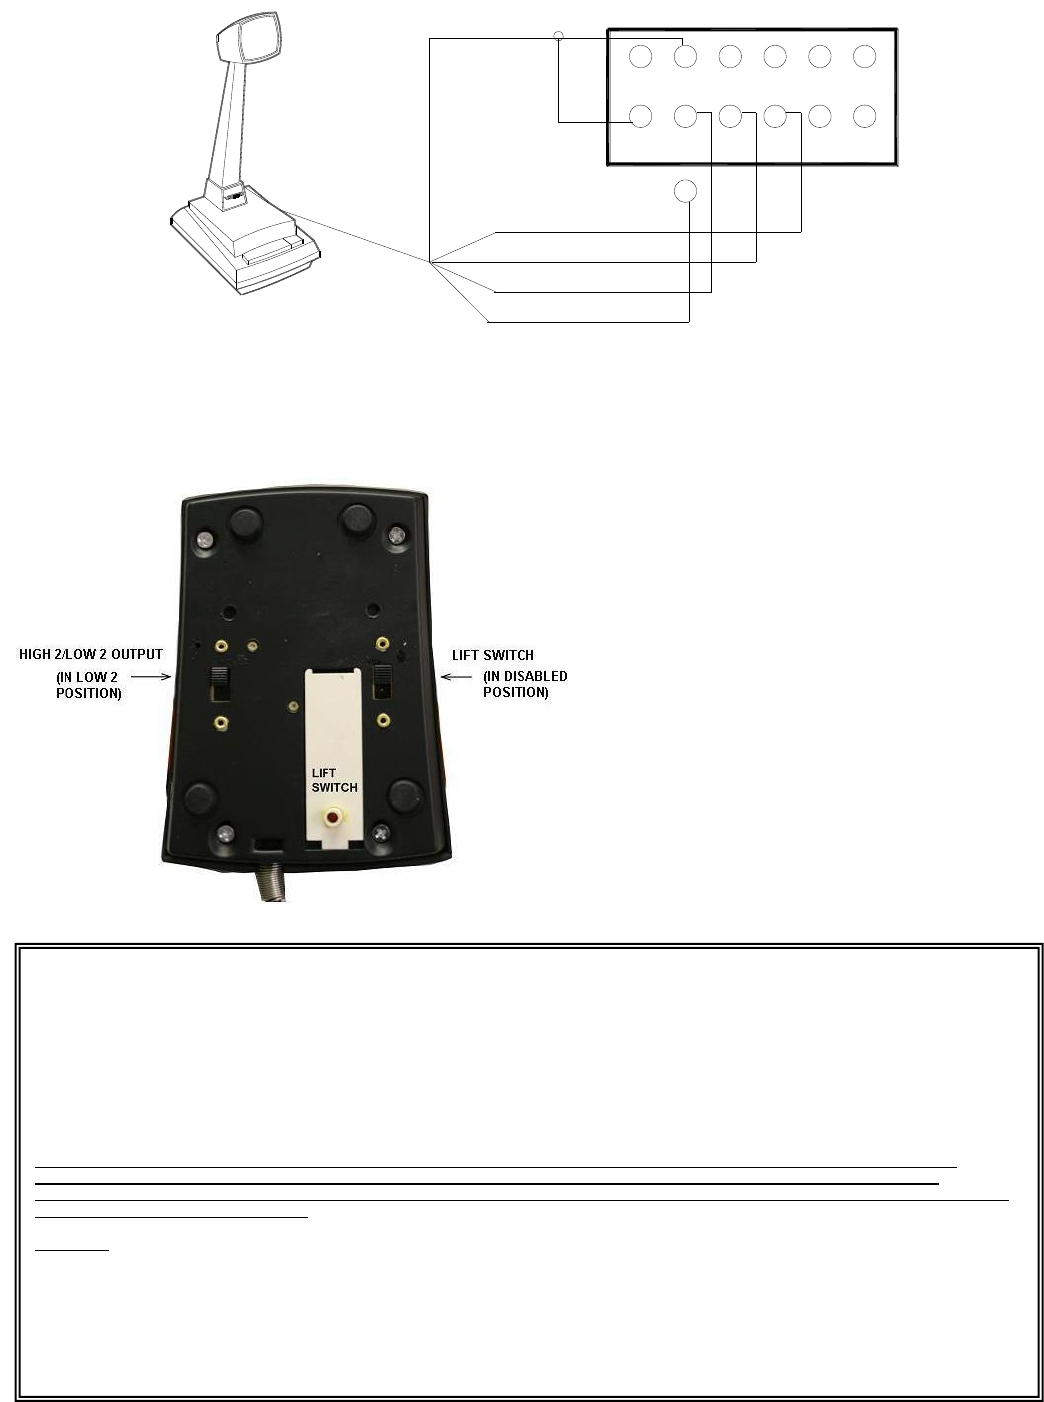 Valcom V 400 Desk Microphone Installation Manual on